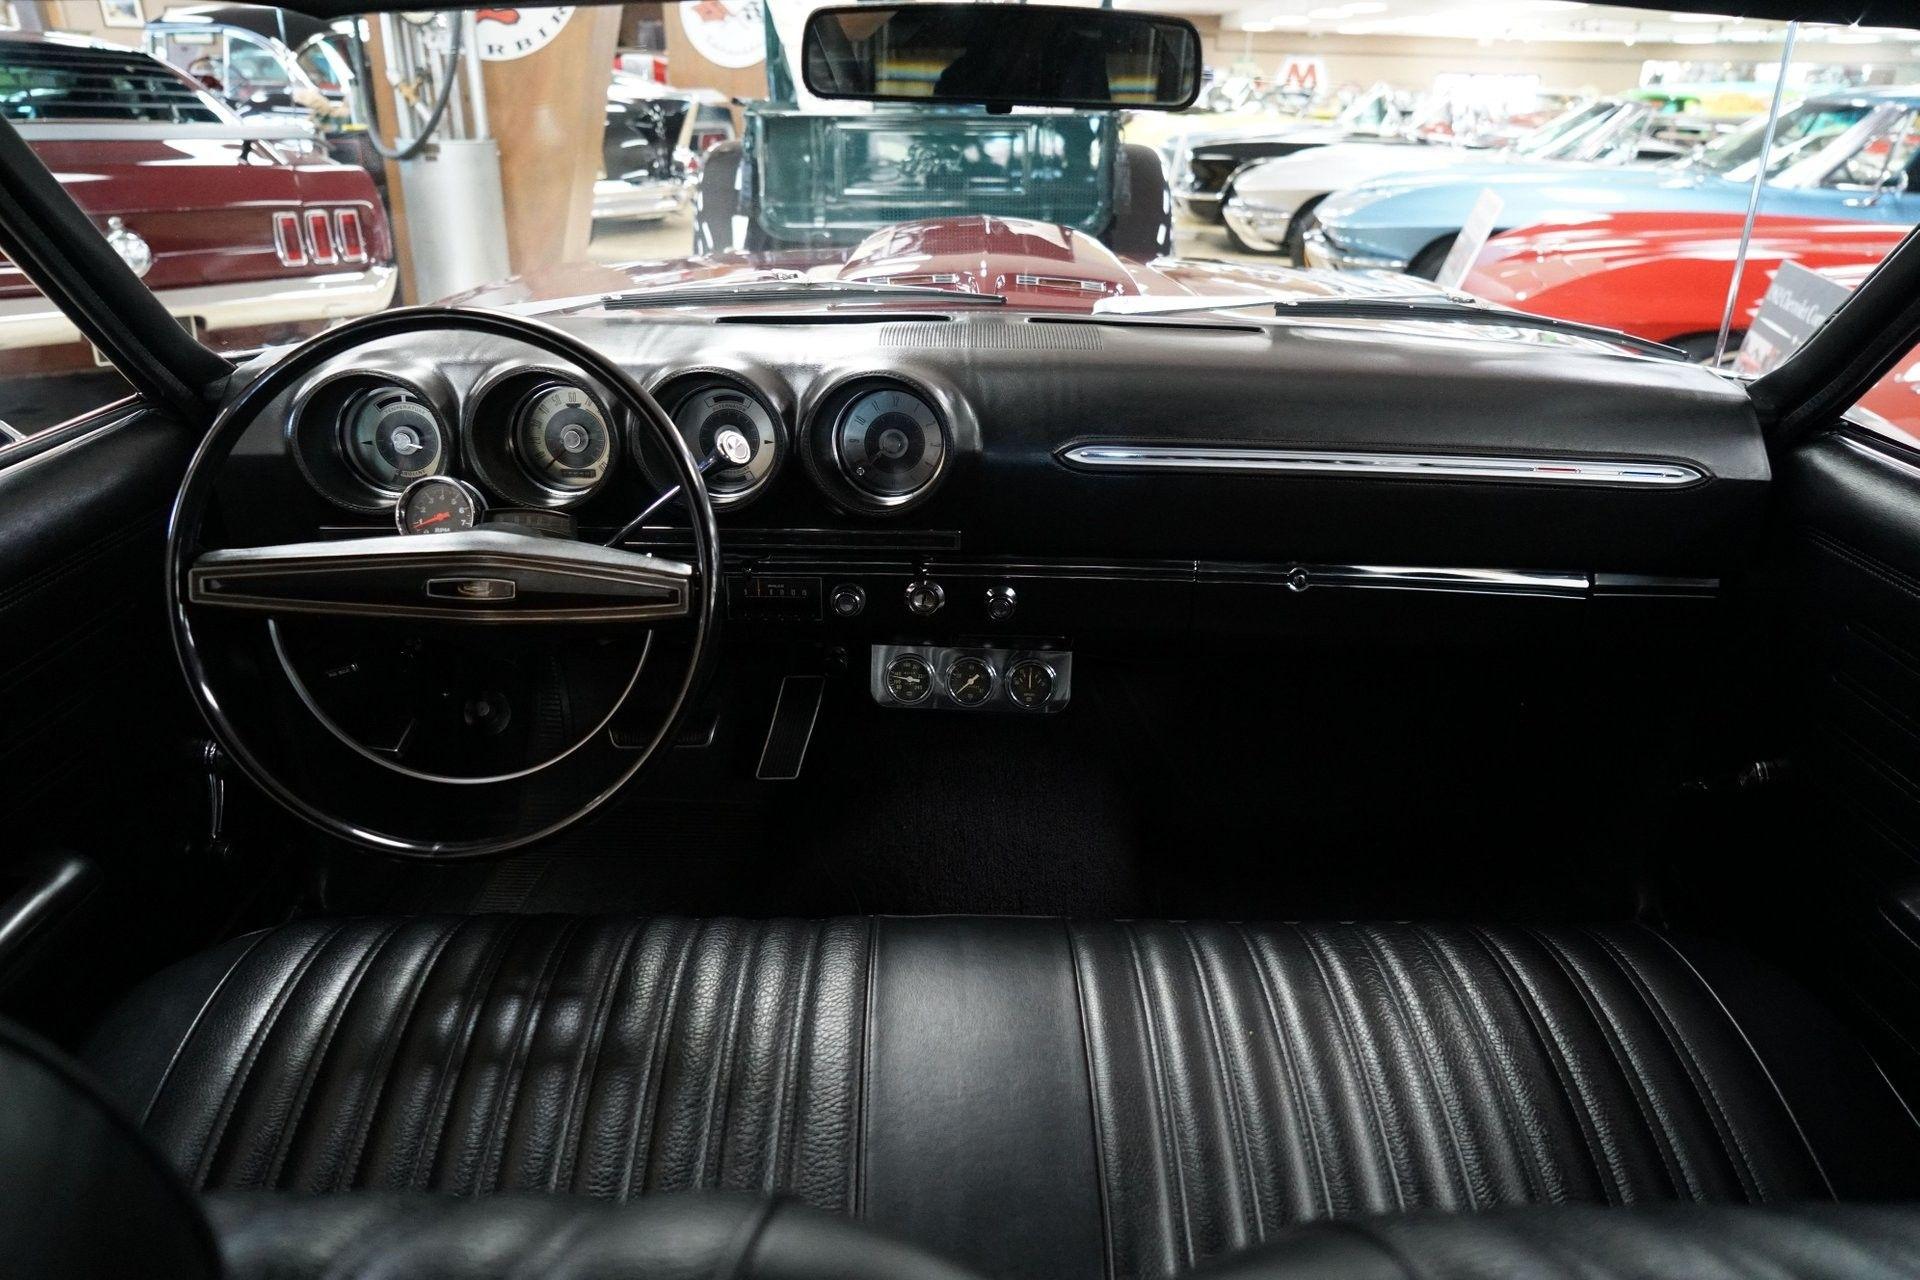 1969 Ford Torino 351c I V8 Engine Desirable Gt Model Ford Torino Fairlane Galaxie